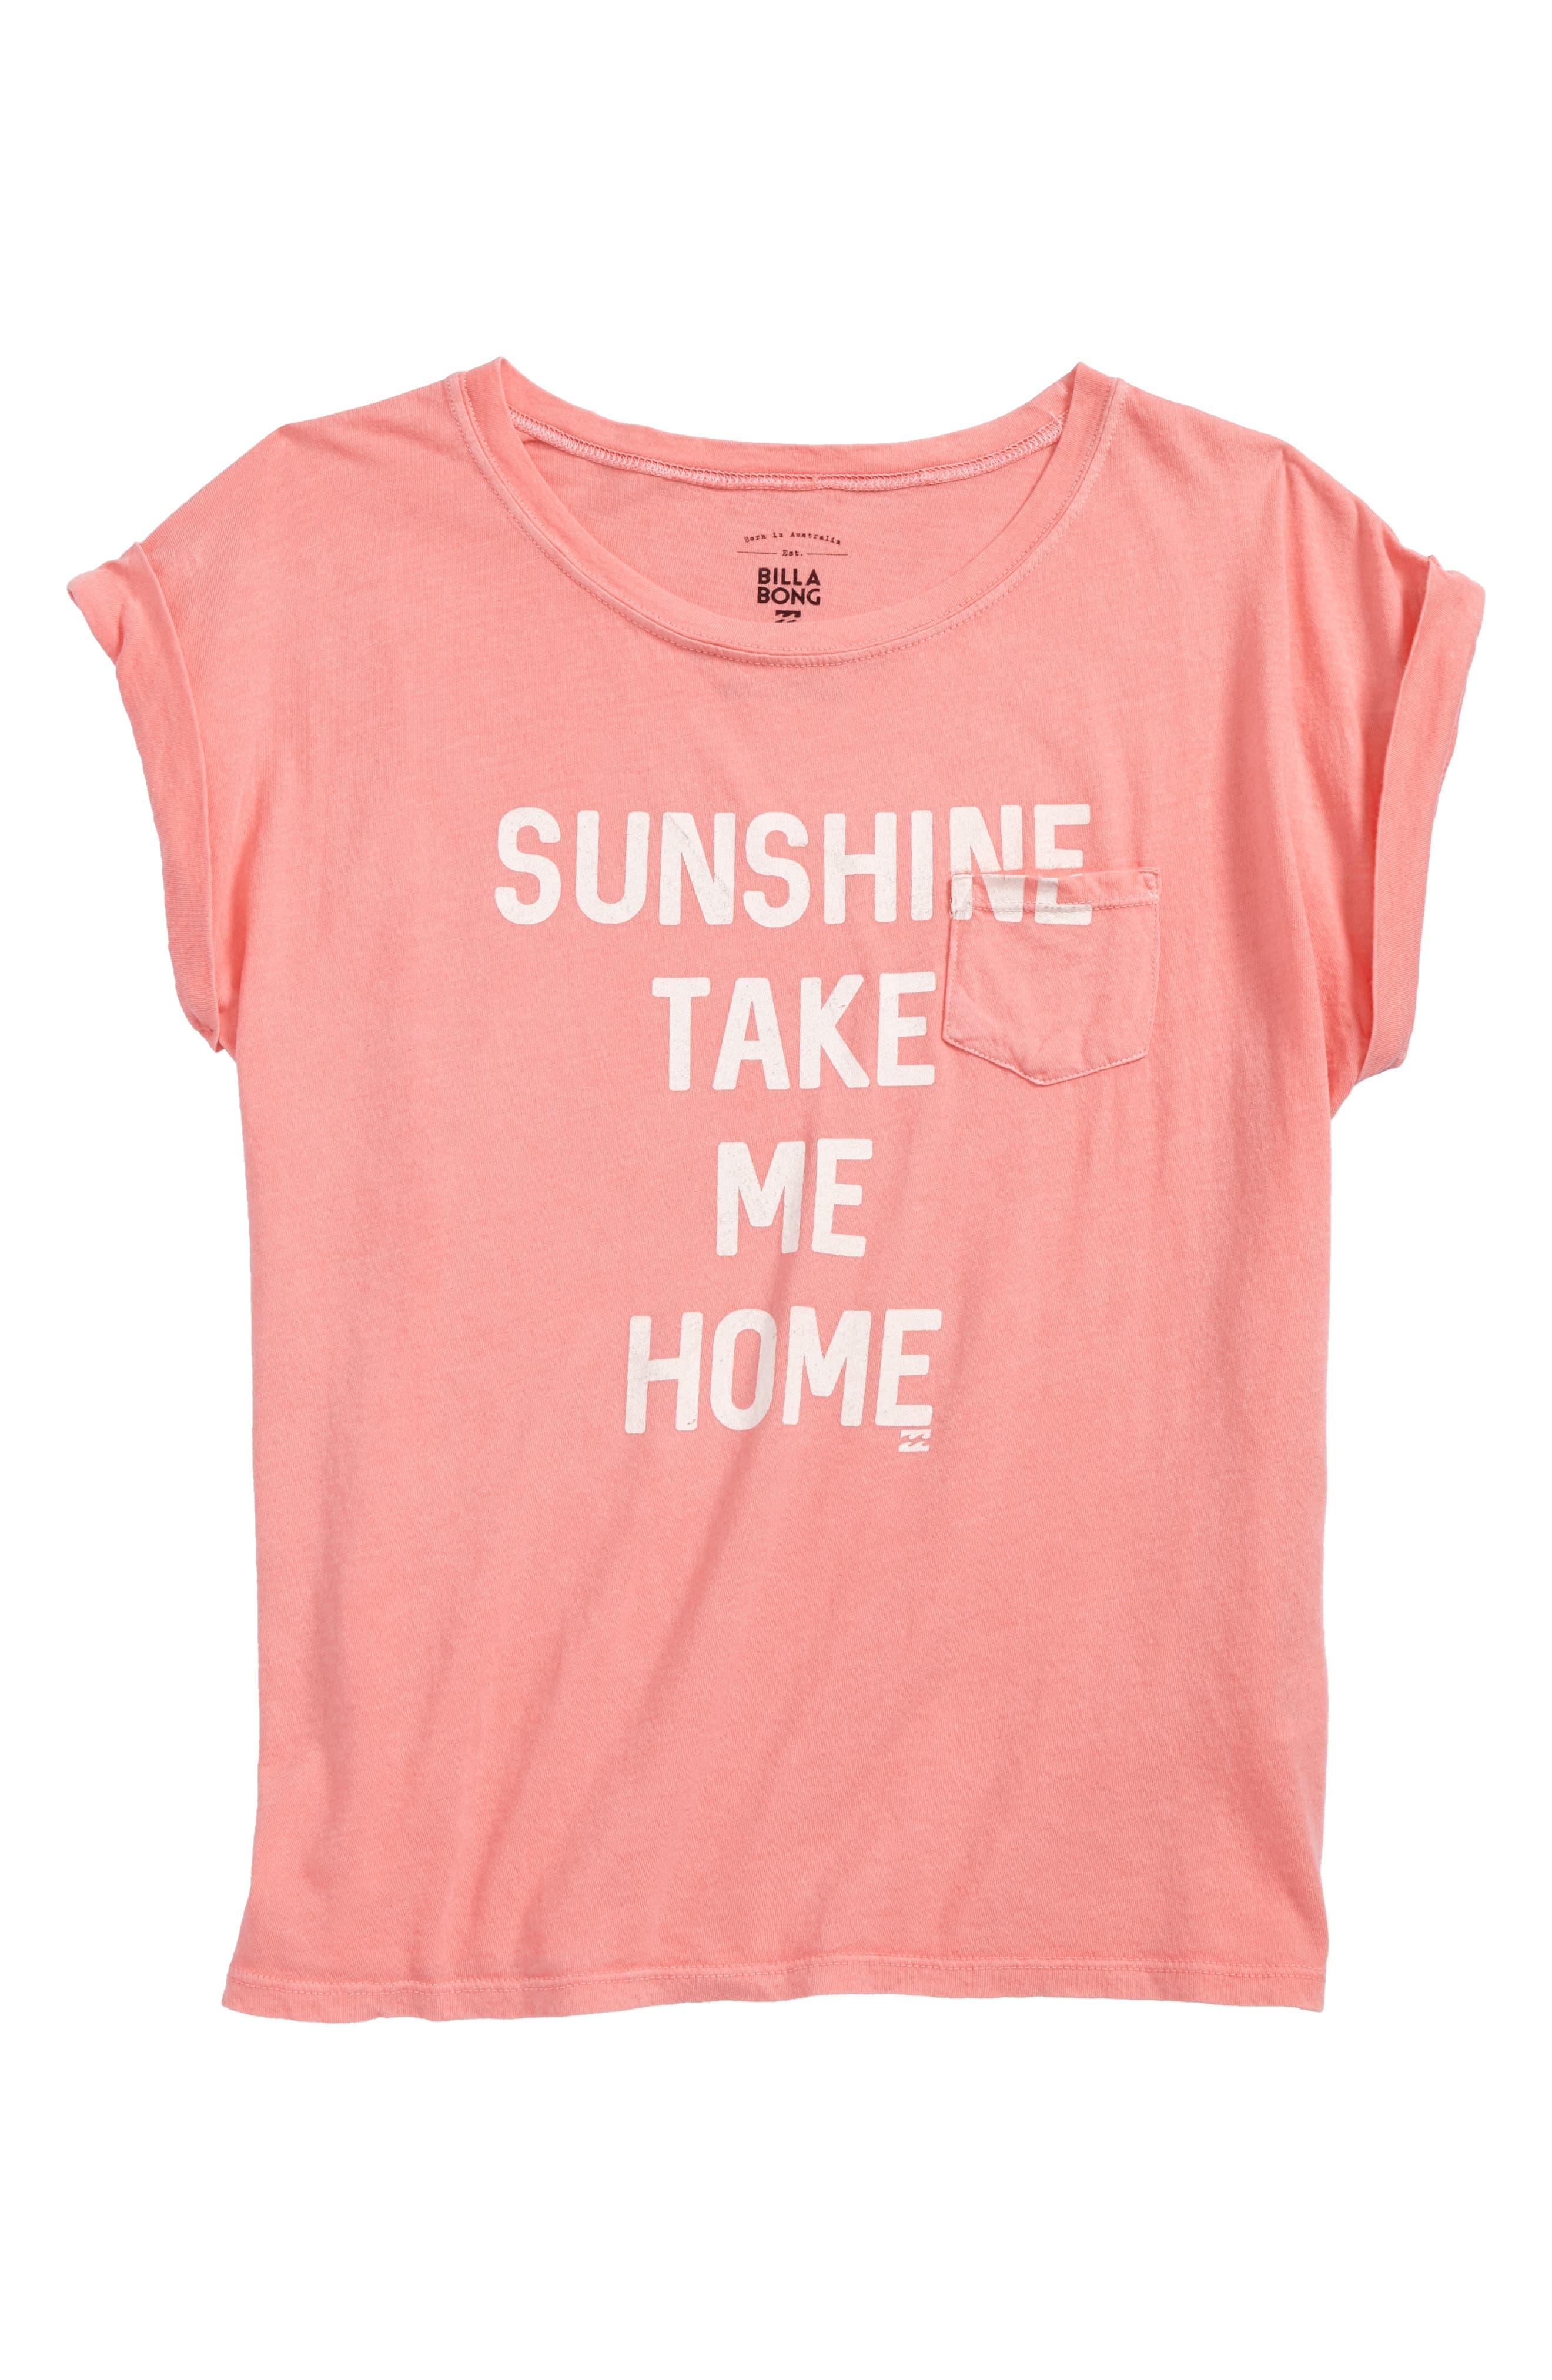 Alternate Image 1 Selected - Billabong Sunshine Take Me Home Graphic Tee (Little Girls & Big Girls)